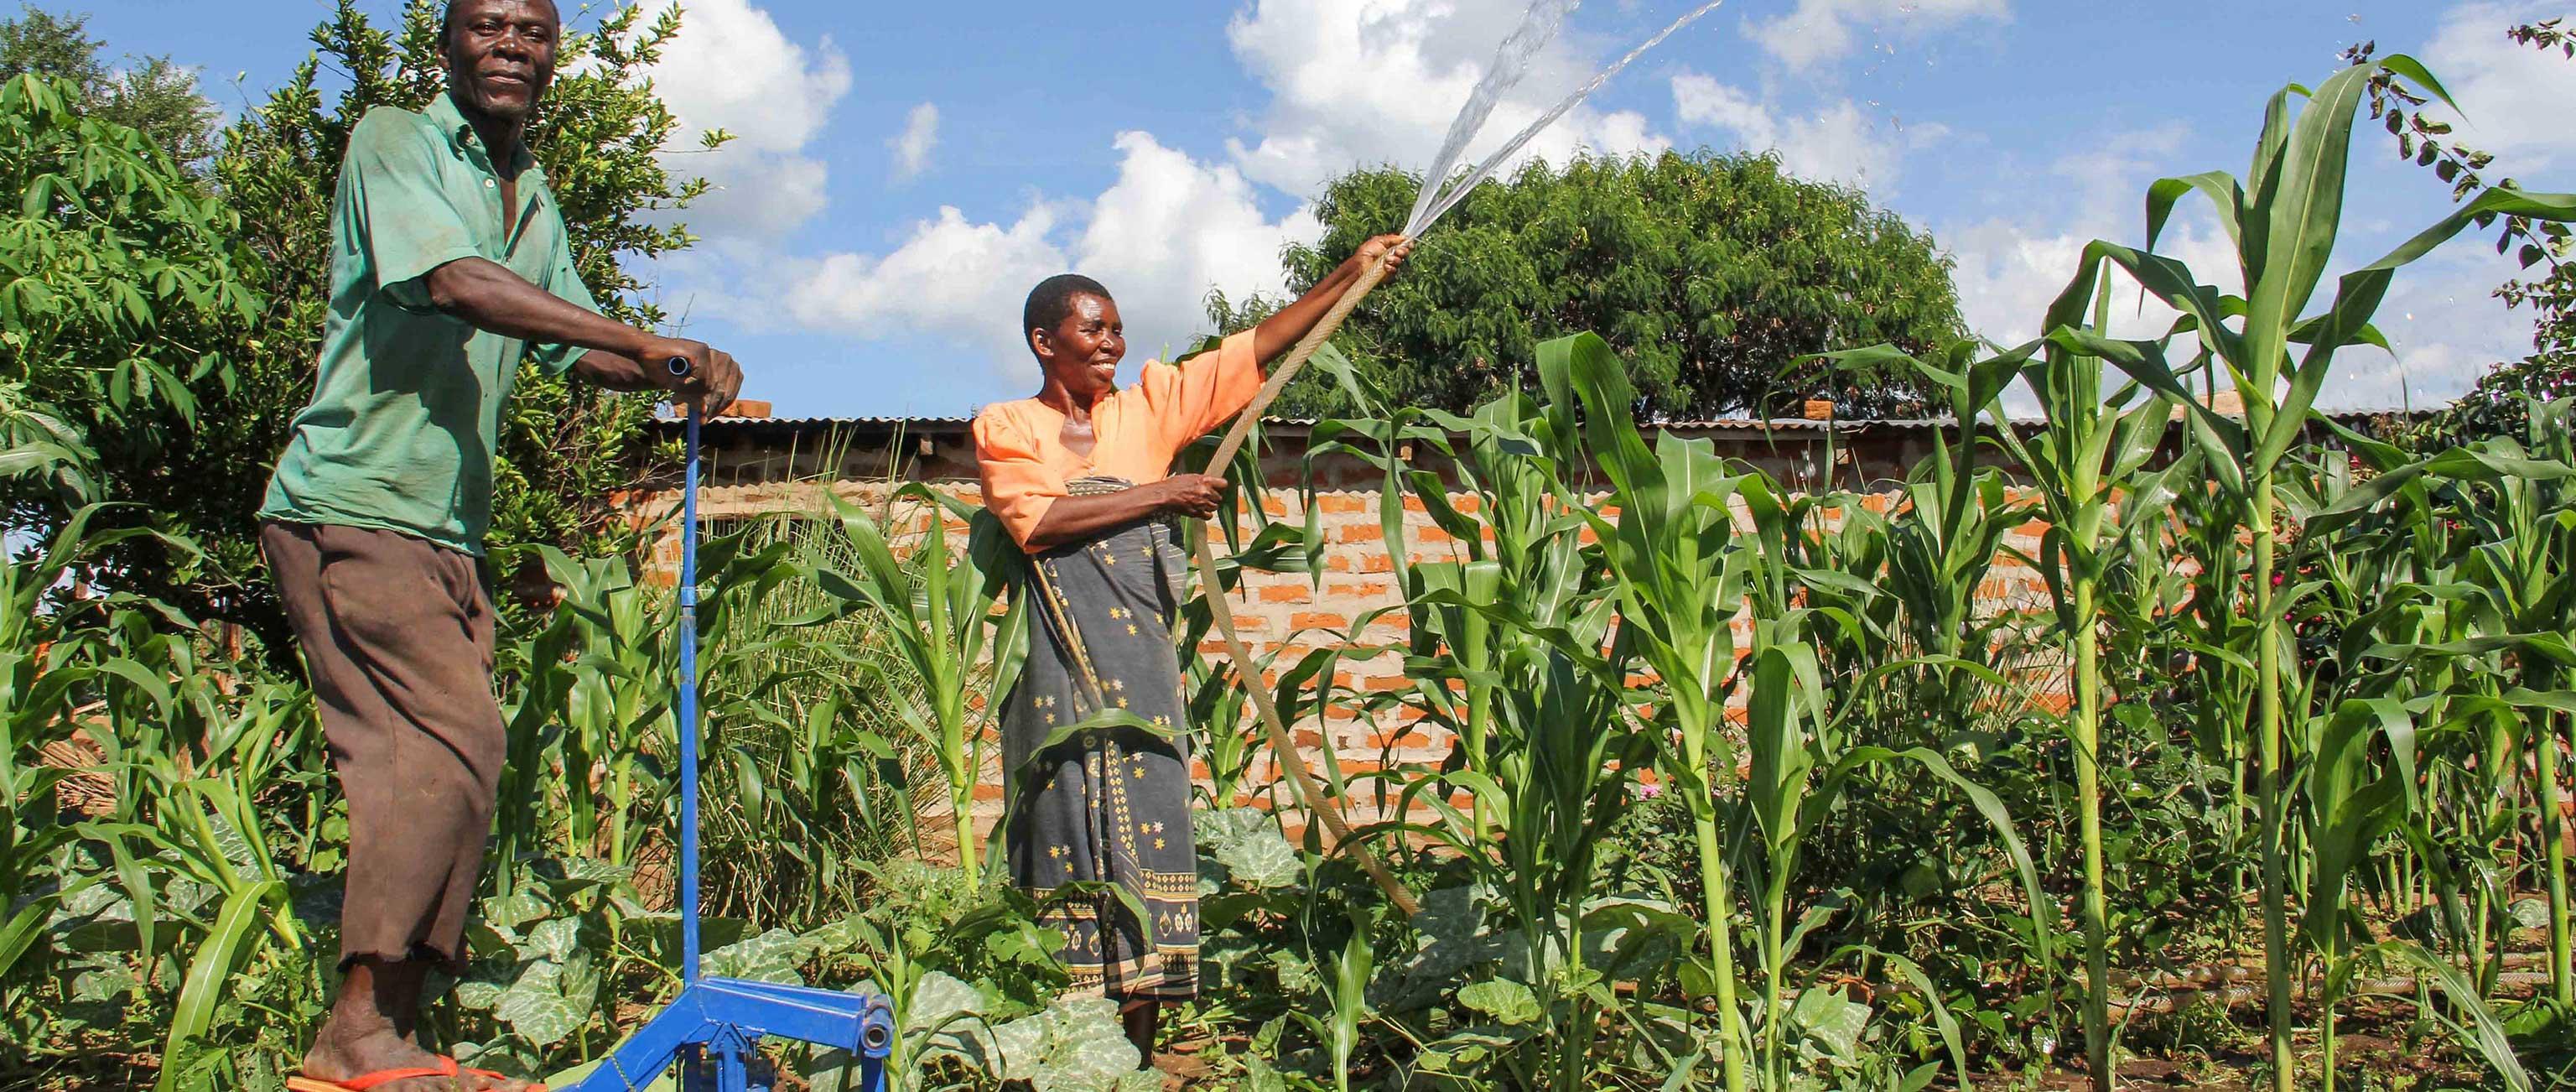 How Kickstart is Mobilizing an Irrigation Movement in Sub-Saharan Africa